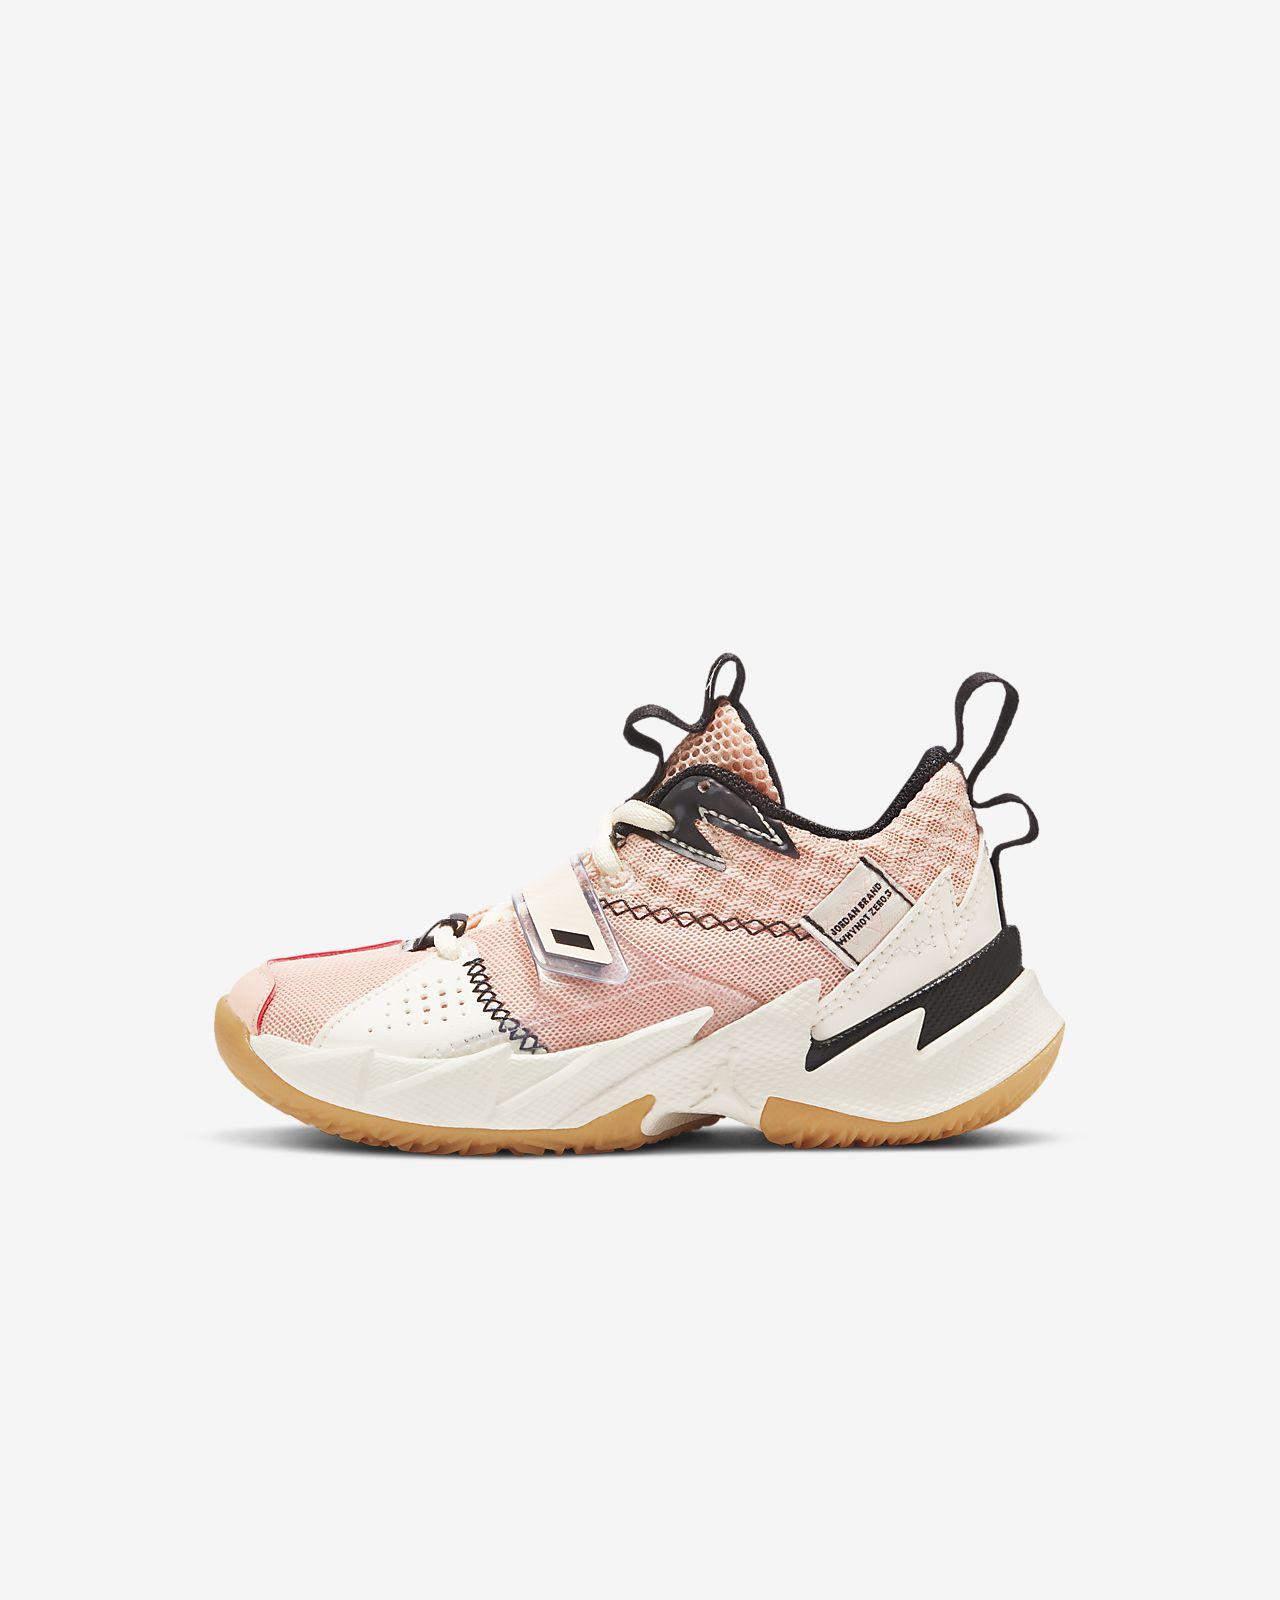 Jordan Why Not Zer0.3 (PS) 幼童运动童鞋